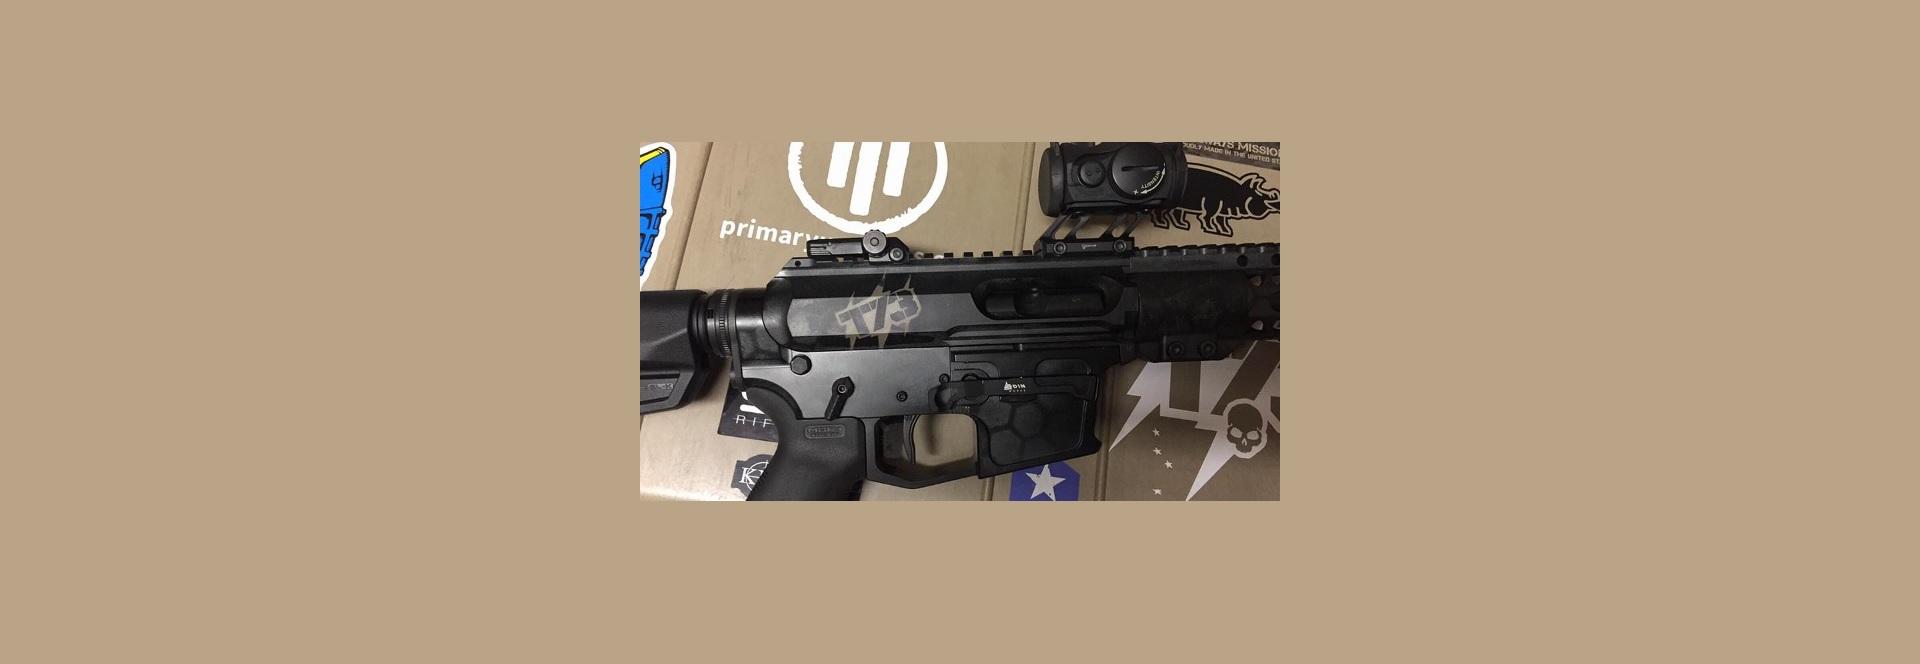 T73 Tac 9-Pistol